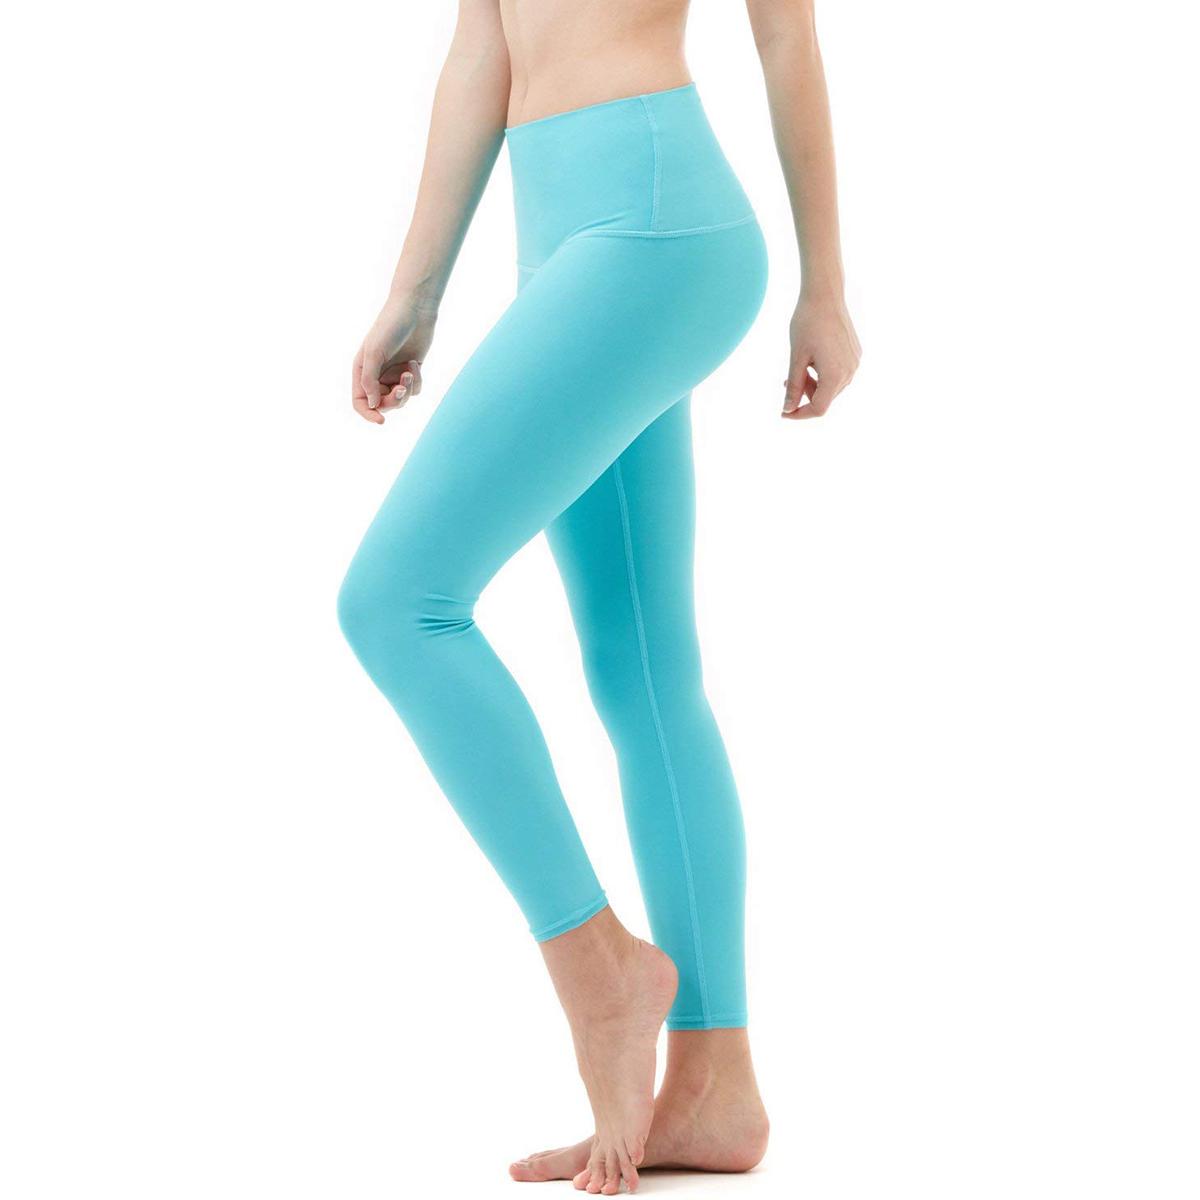 thumbnail 14 - TSLA Tesla FYP52 Women's High-Waisted Ultra-Stretch Tummy Control Yoga Pants